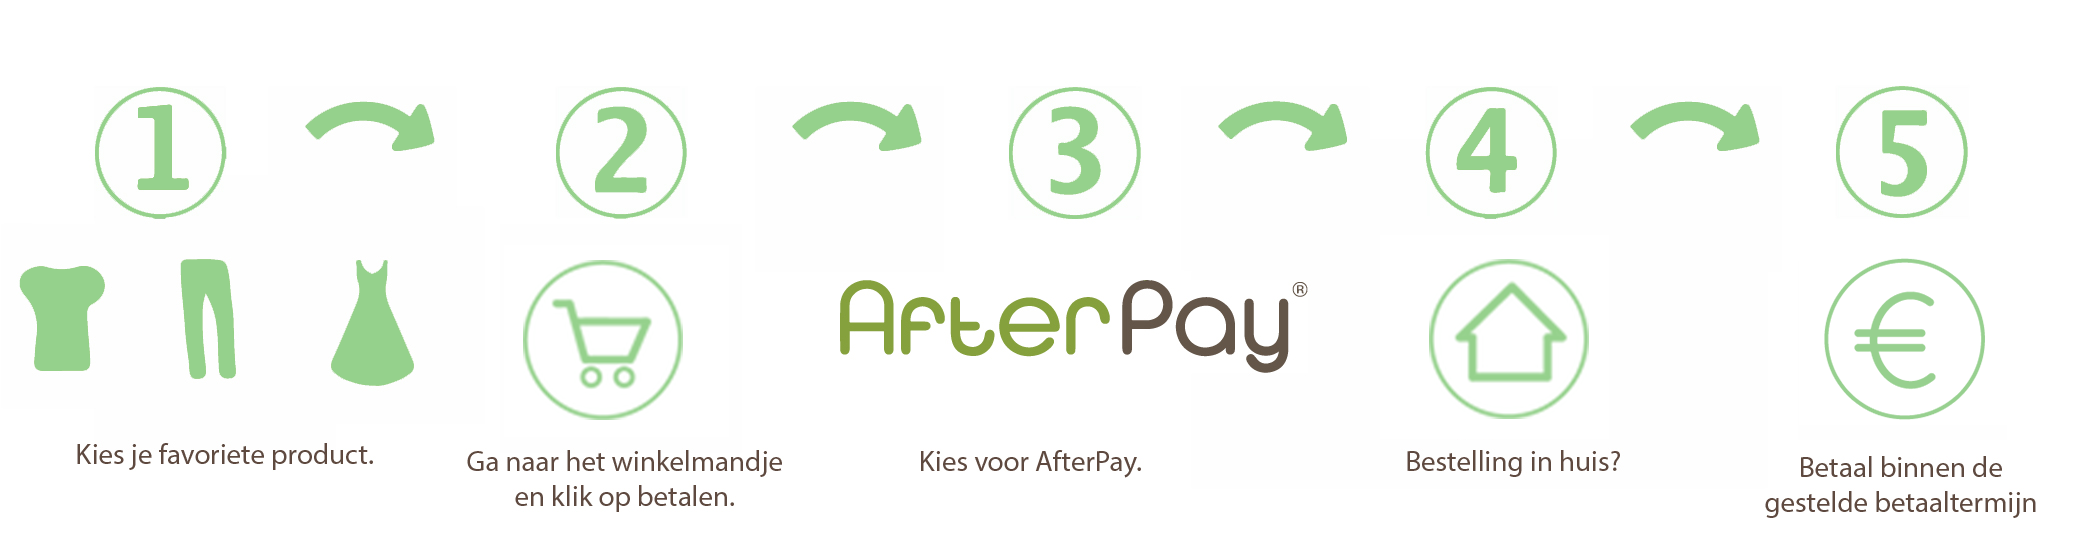 Hoe werkt Afterpay